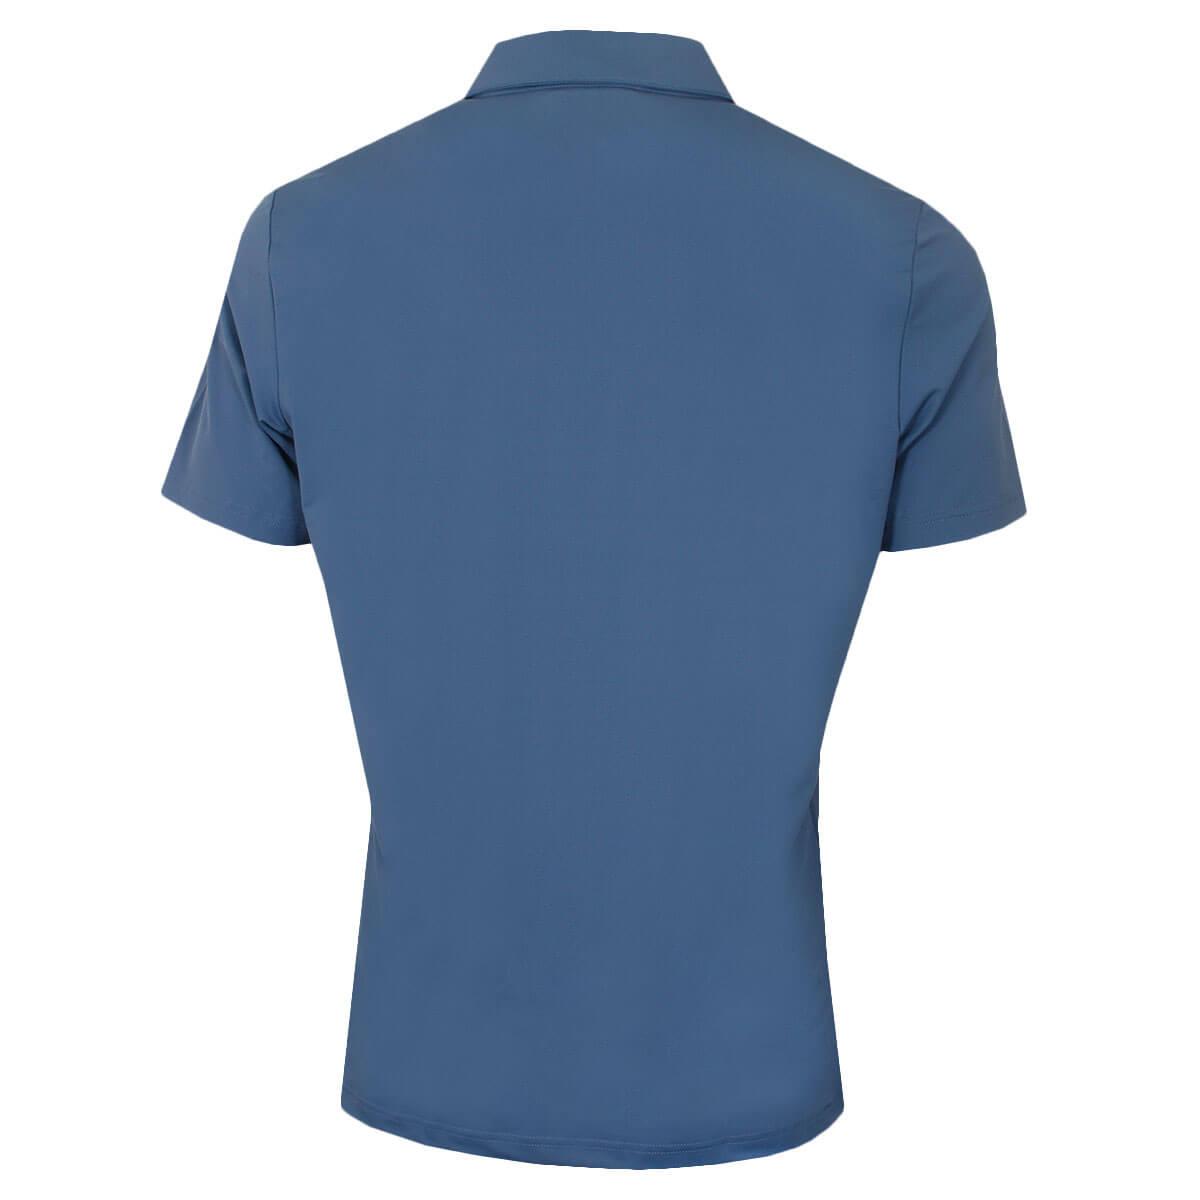 Adidas-Golf-Men-039-s-Ultimate-2-0-Solid-Crestable-Polo-Shirt thumbnail 29